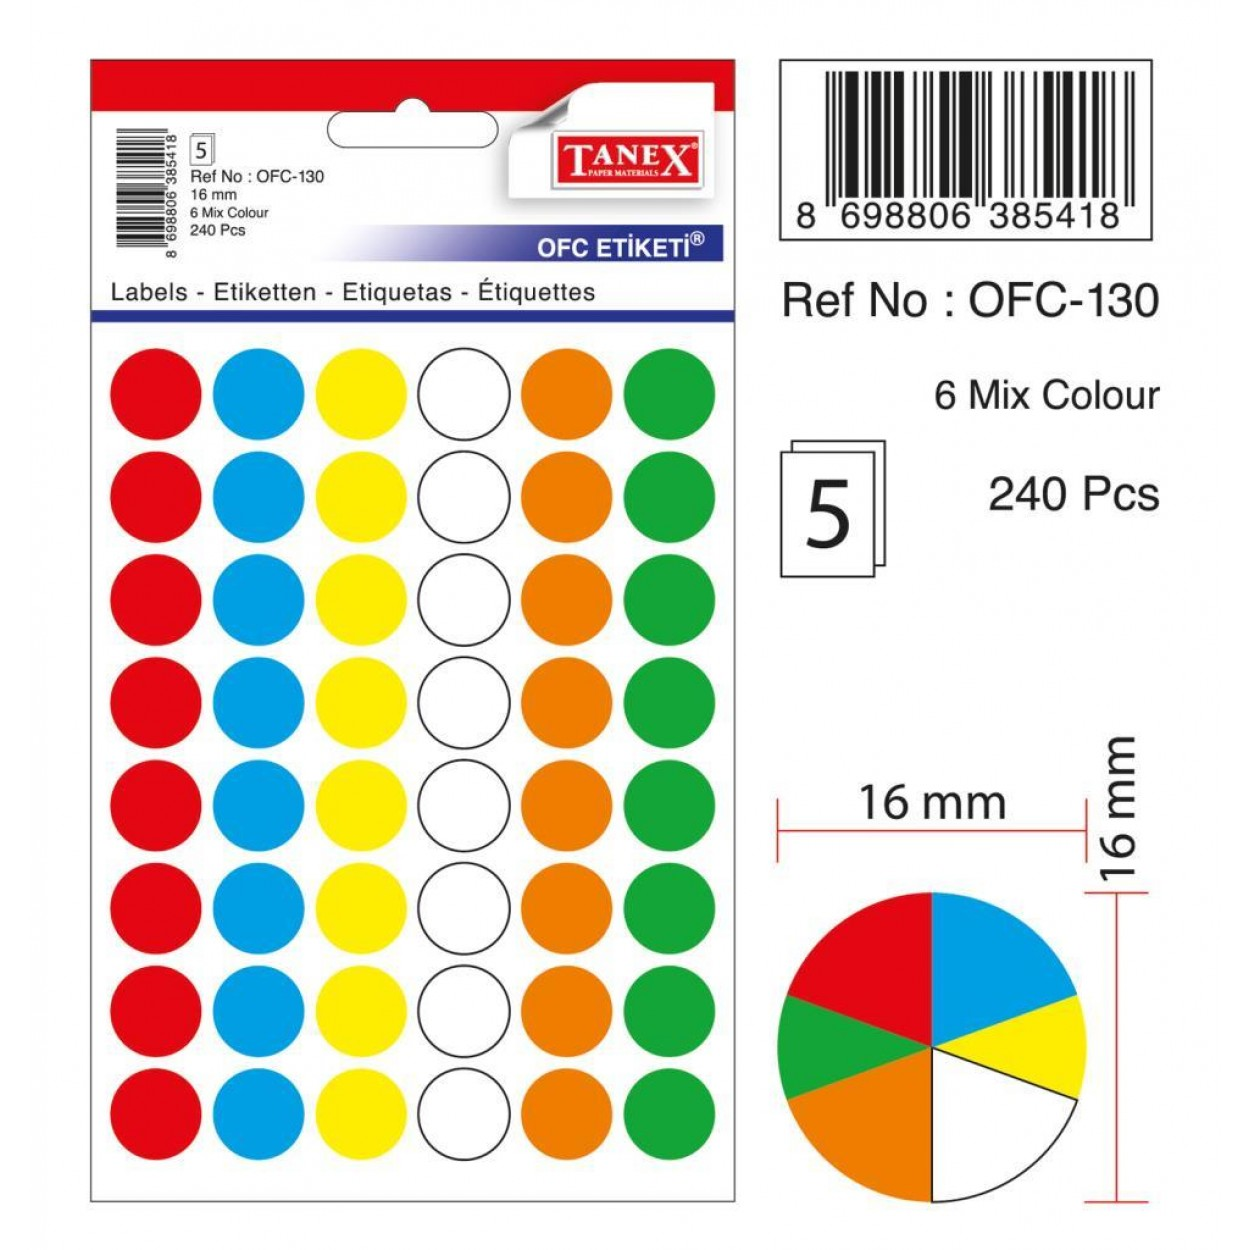 Tanex Ofc-130 Mıx Color Ofis Etiketi 16mm 240 Adet